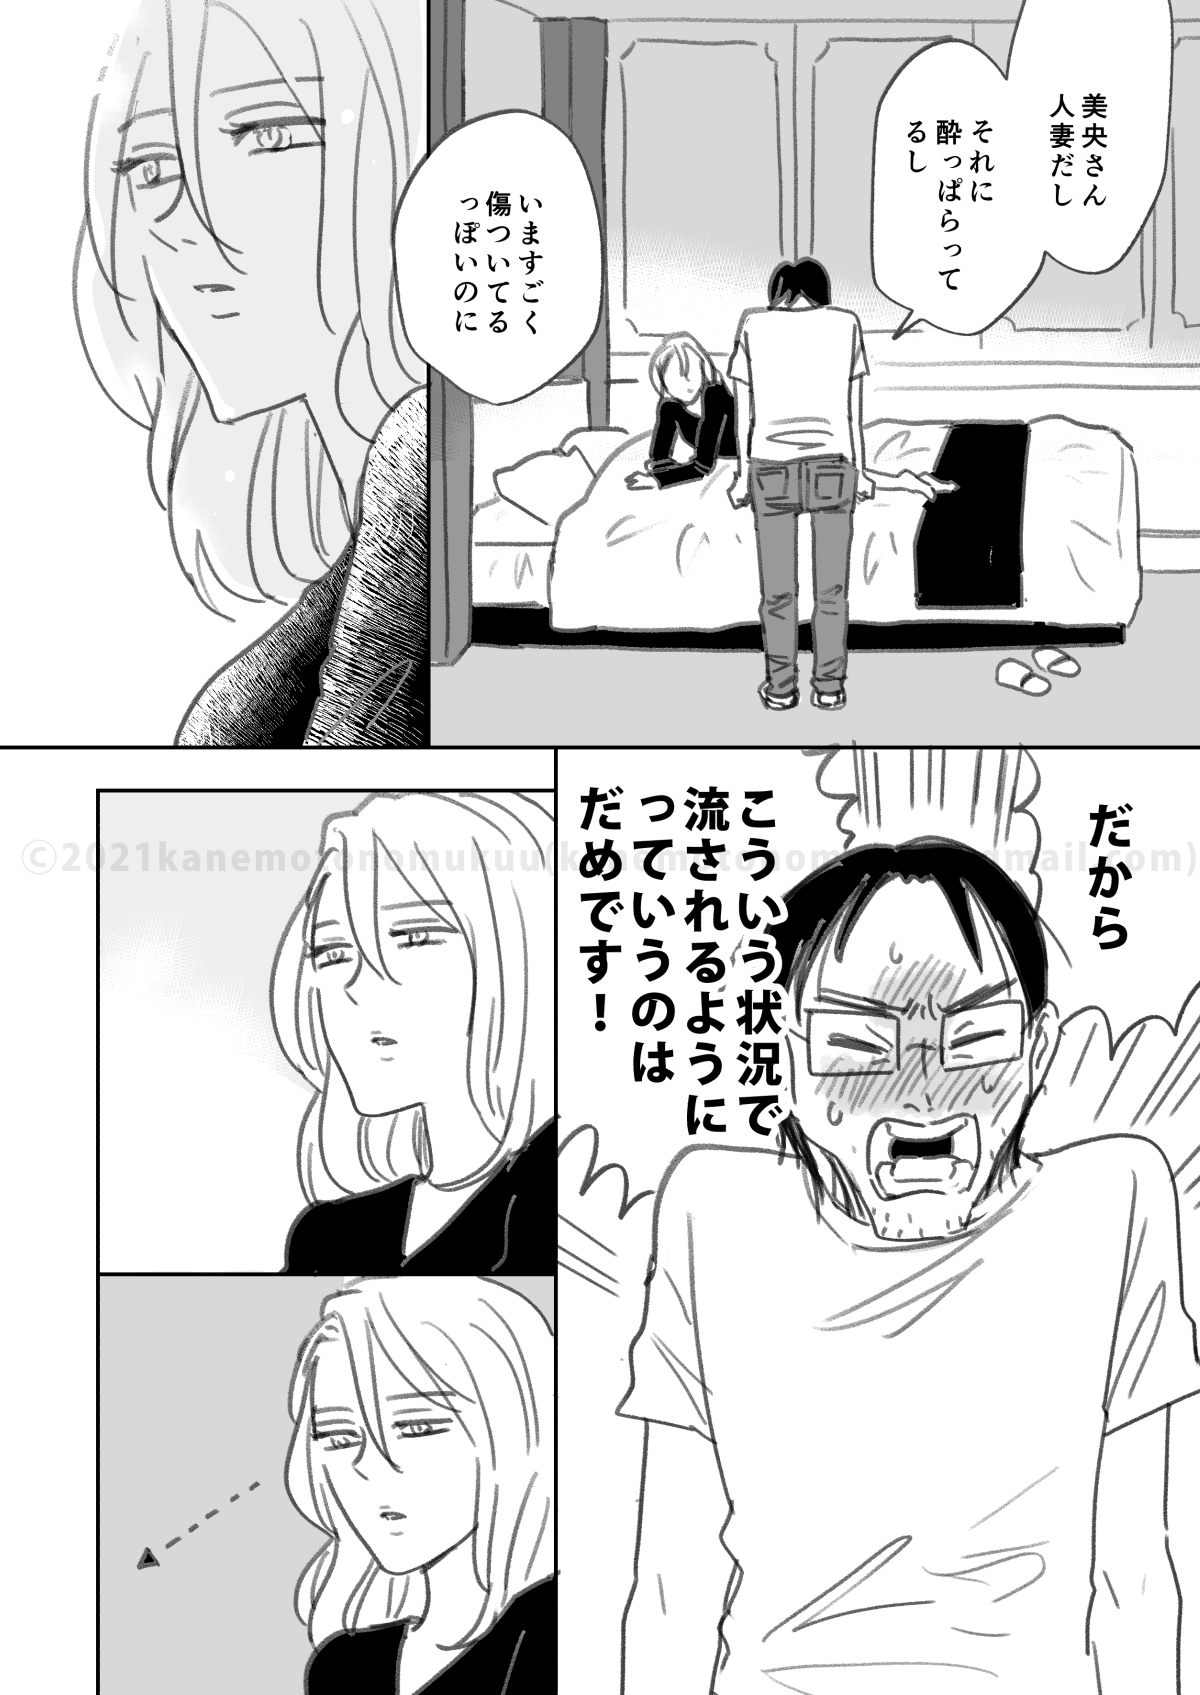 f:id:kanemotonomukuu:20210118100107j:plain